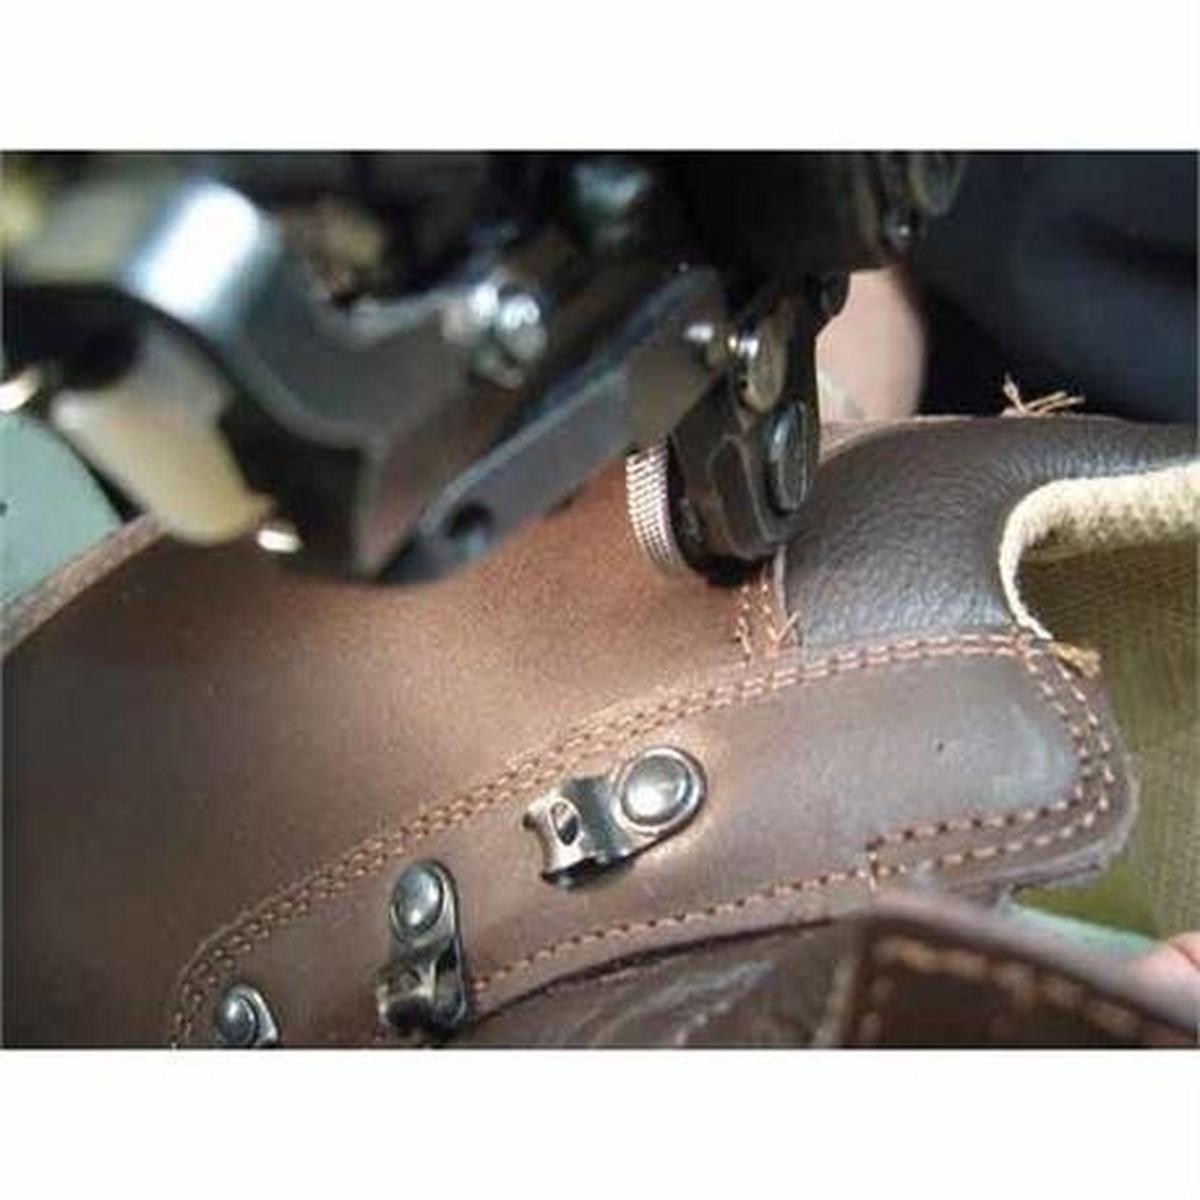 Altberg Boot Care: Leder Gris MoD BROWN Wax 80g